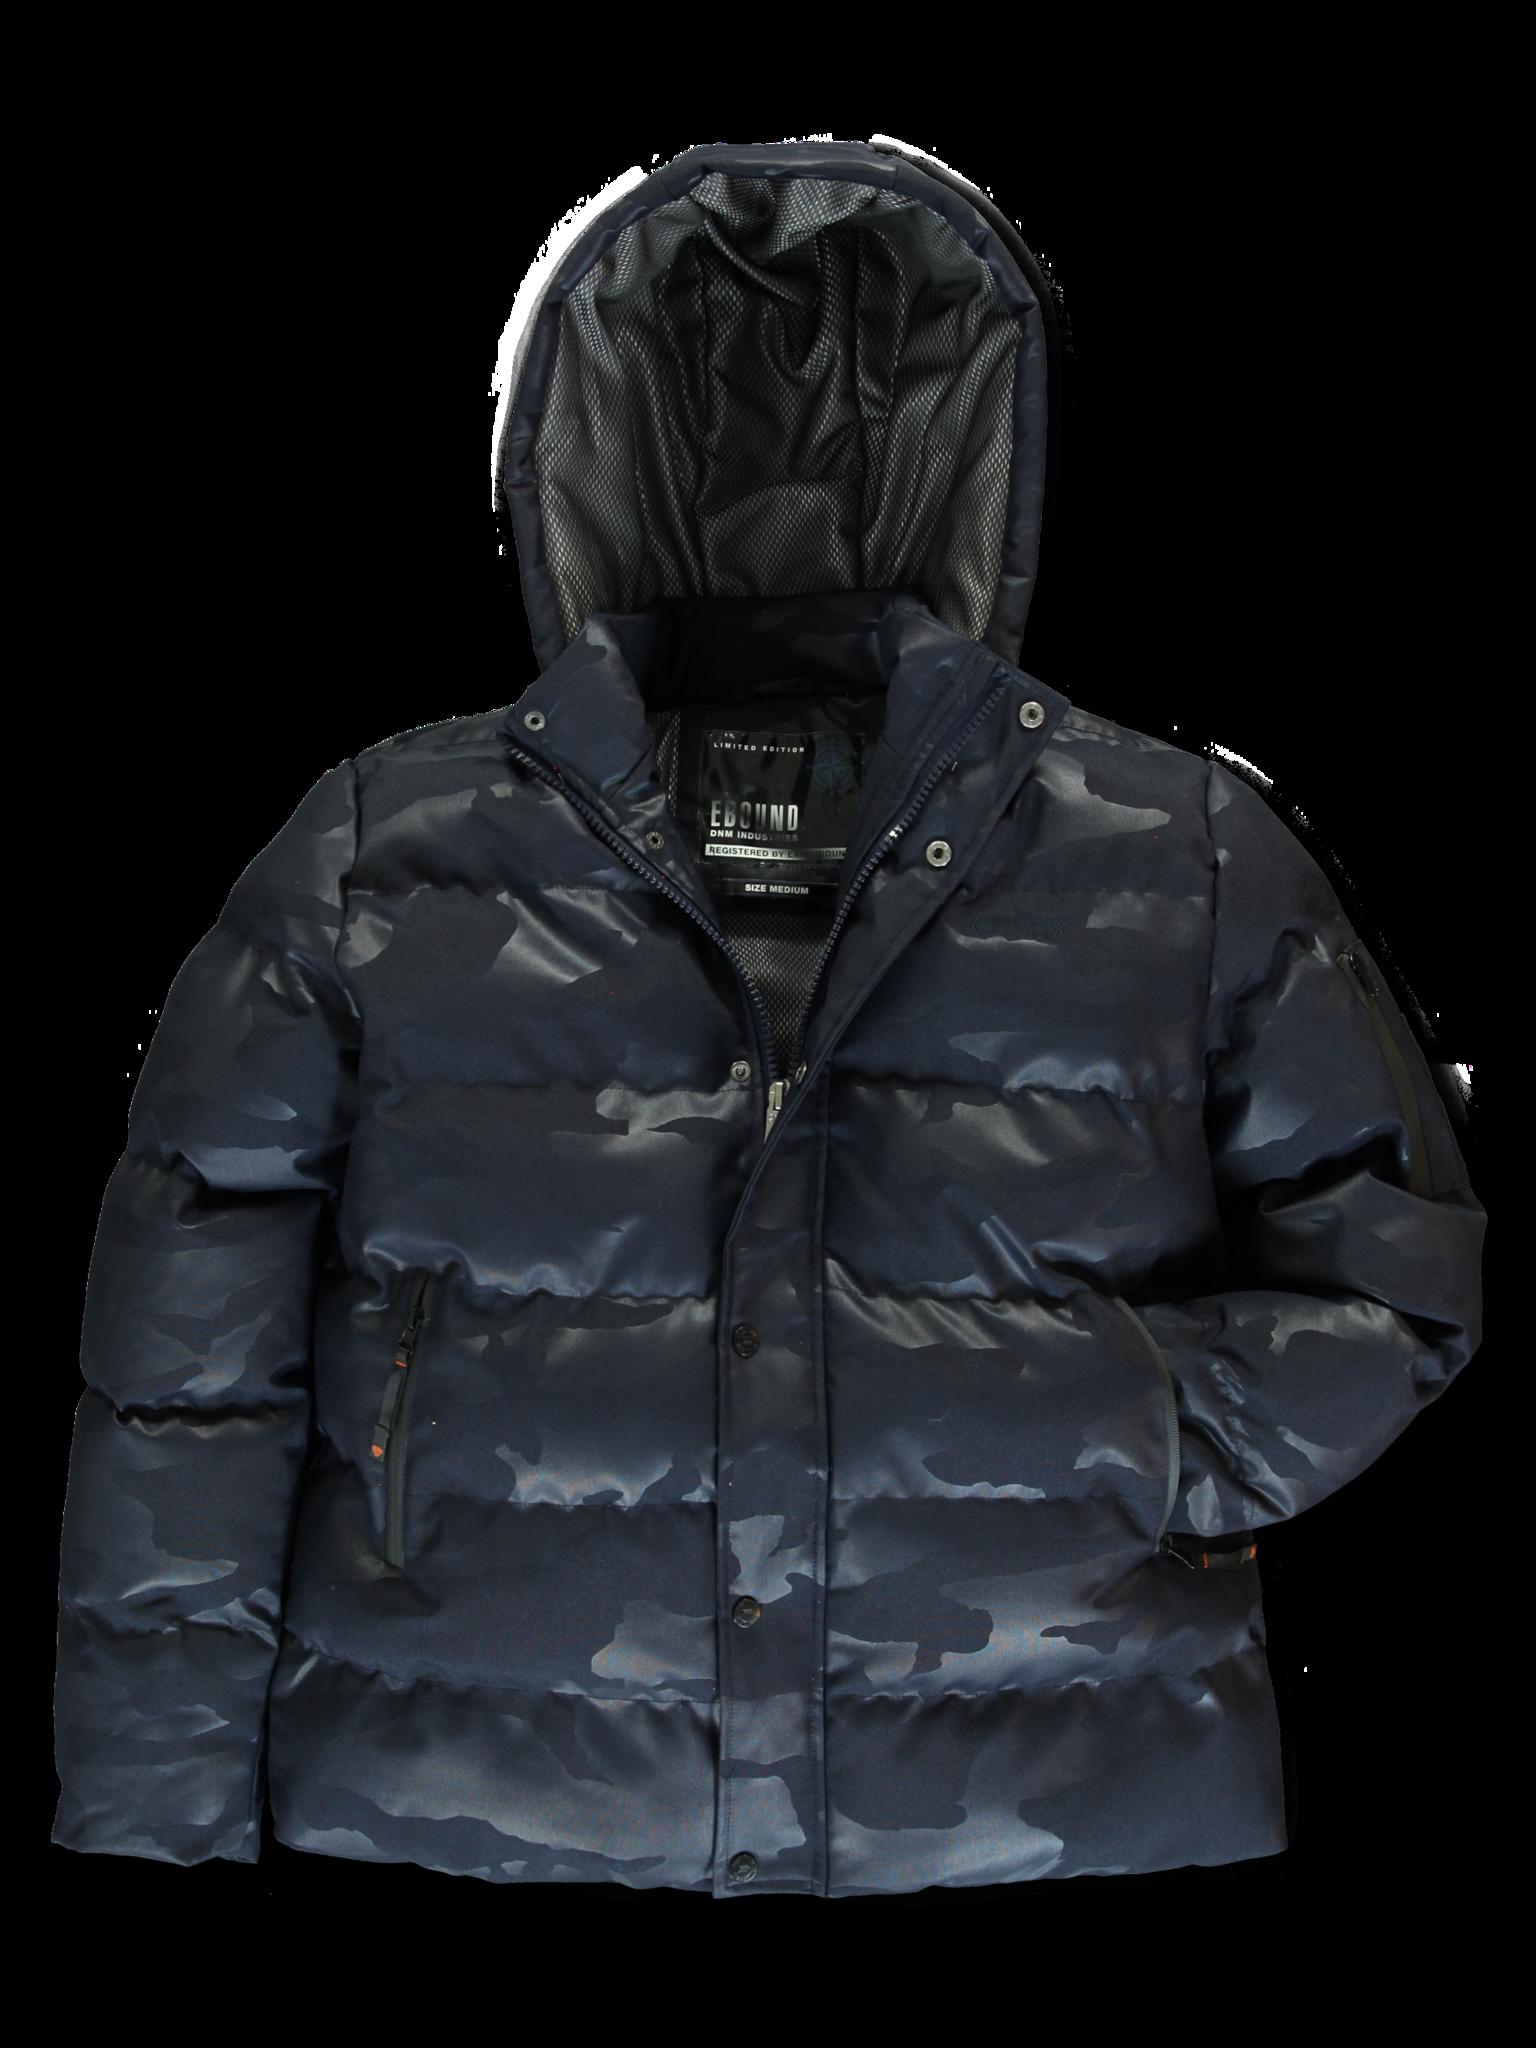 All Brands | Winterproducts Men | Jacket | 12 pcs/box